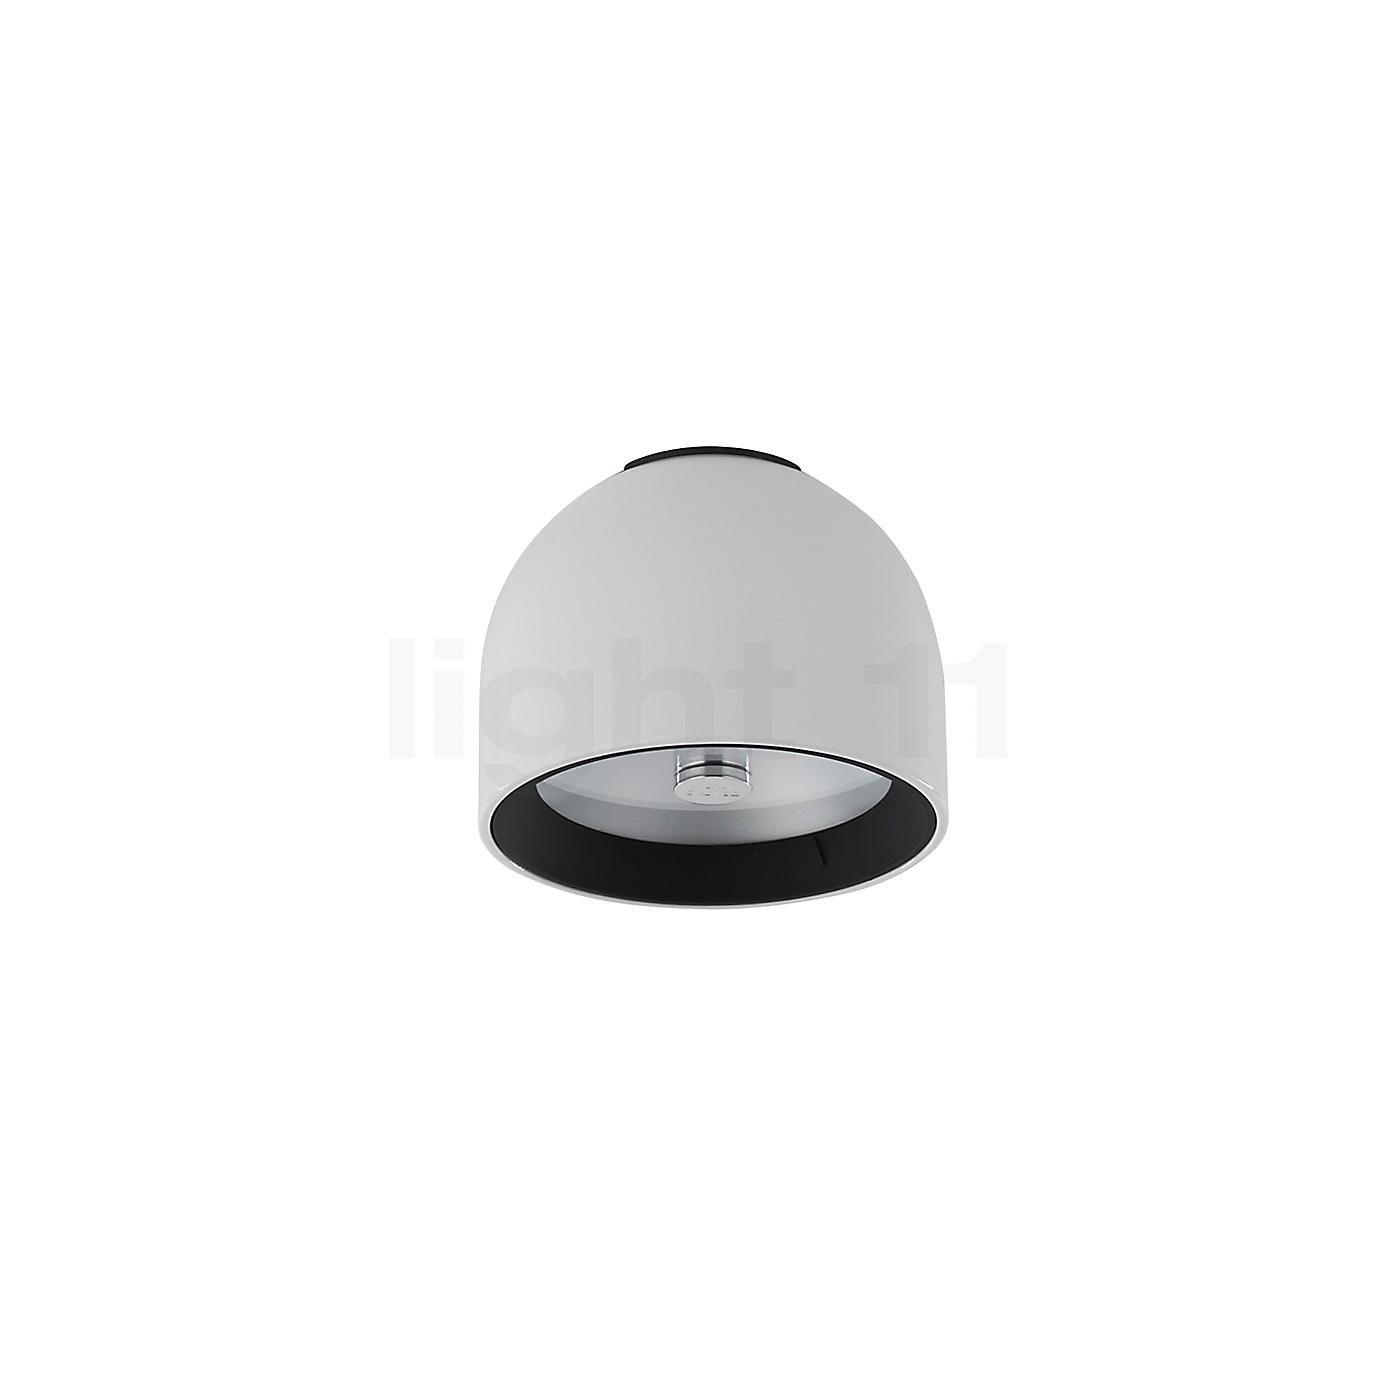 flos wan lampe murale ou plafonnier plafonniers lampes. Black Bedroom Furniture Sets. Home Design Ideas